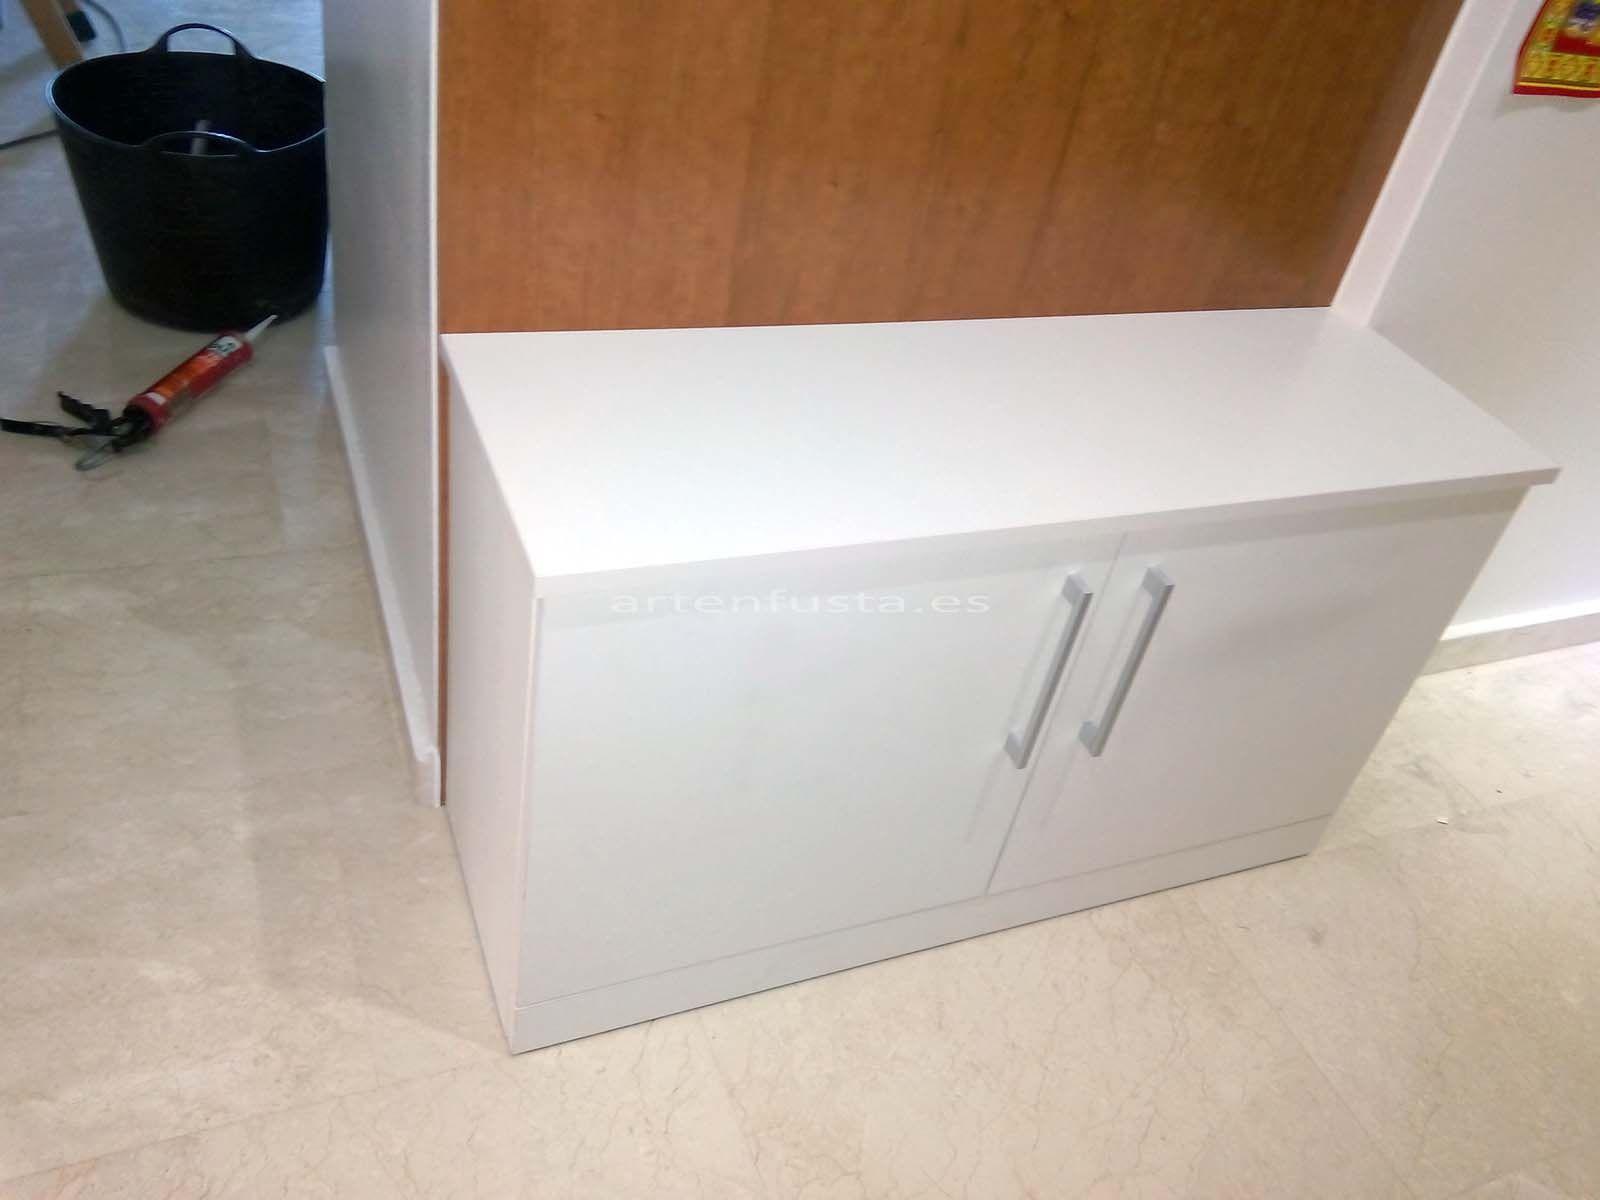 Mueble de entrada a medida zapatero perchero cerezo y blanco elche 4 carpinter a j jimenez - Mueble zapatero a medida ...